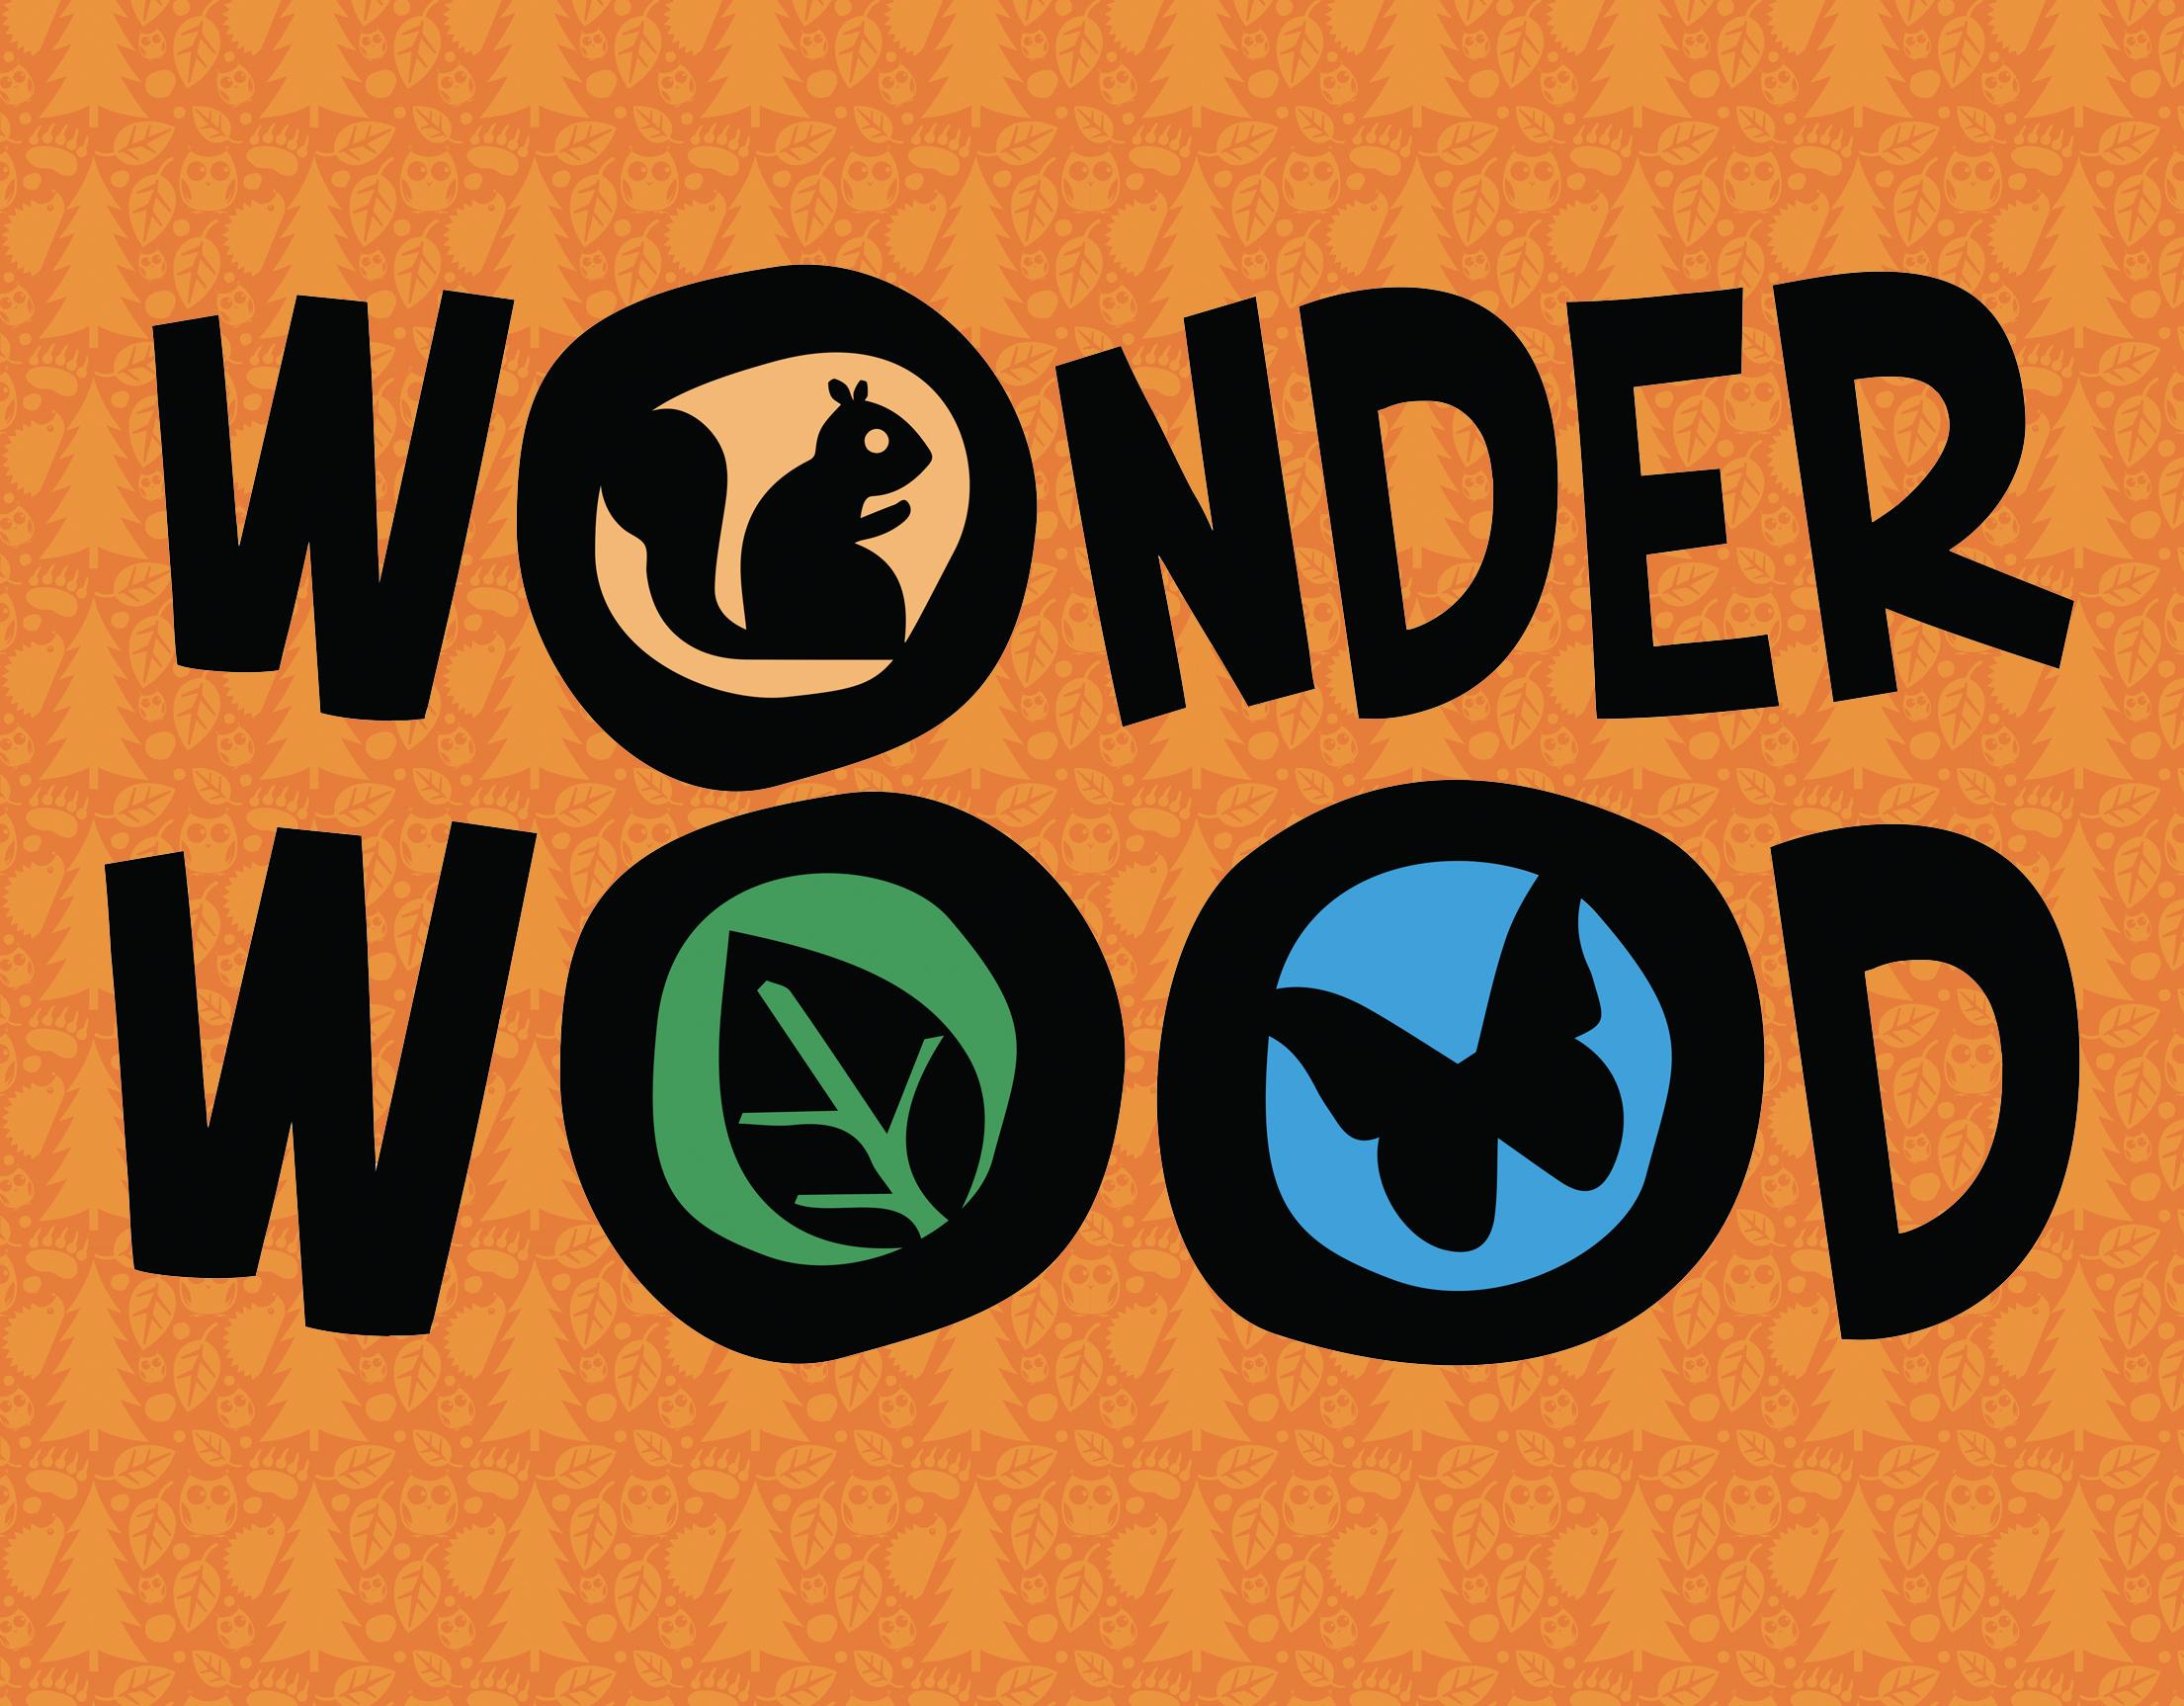 Wonderwood Park